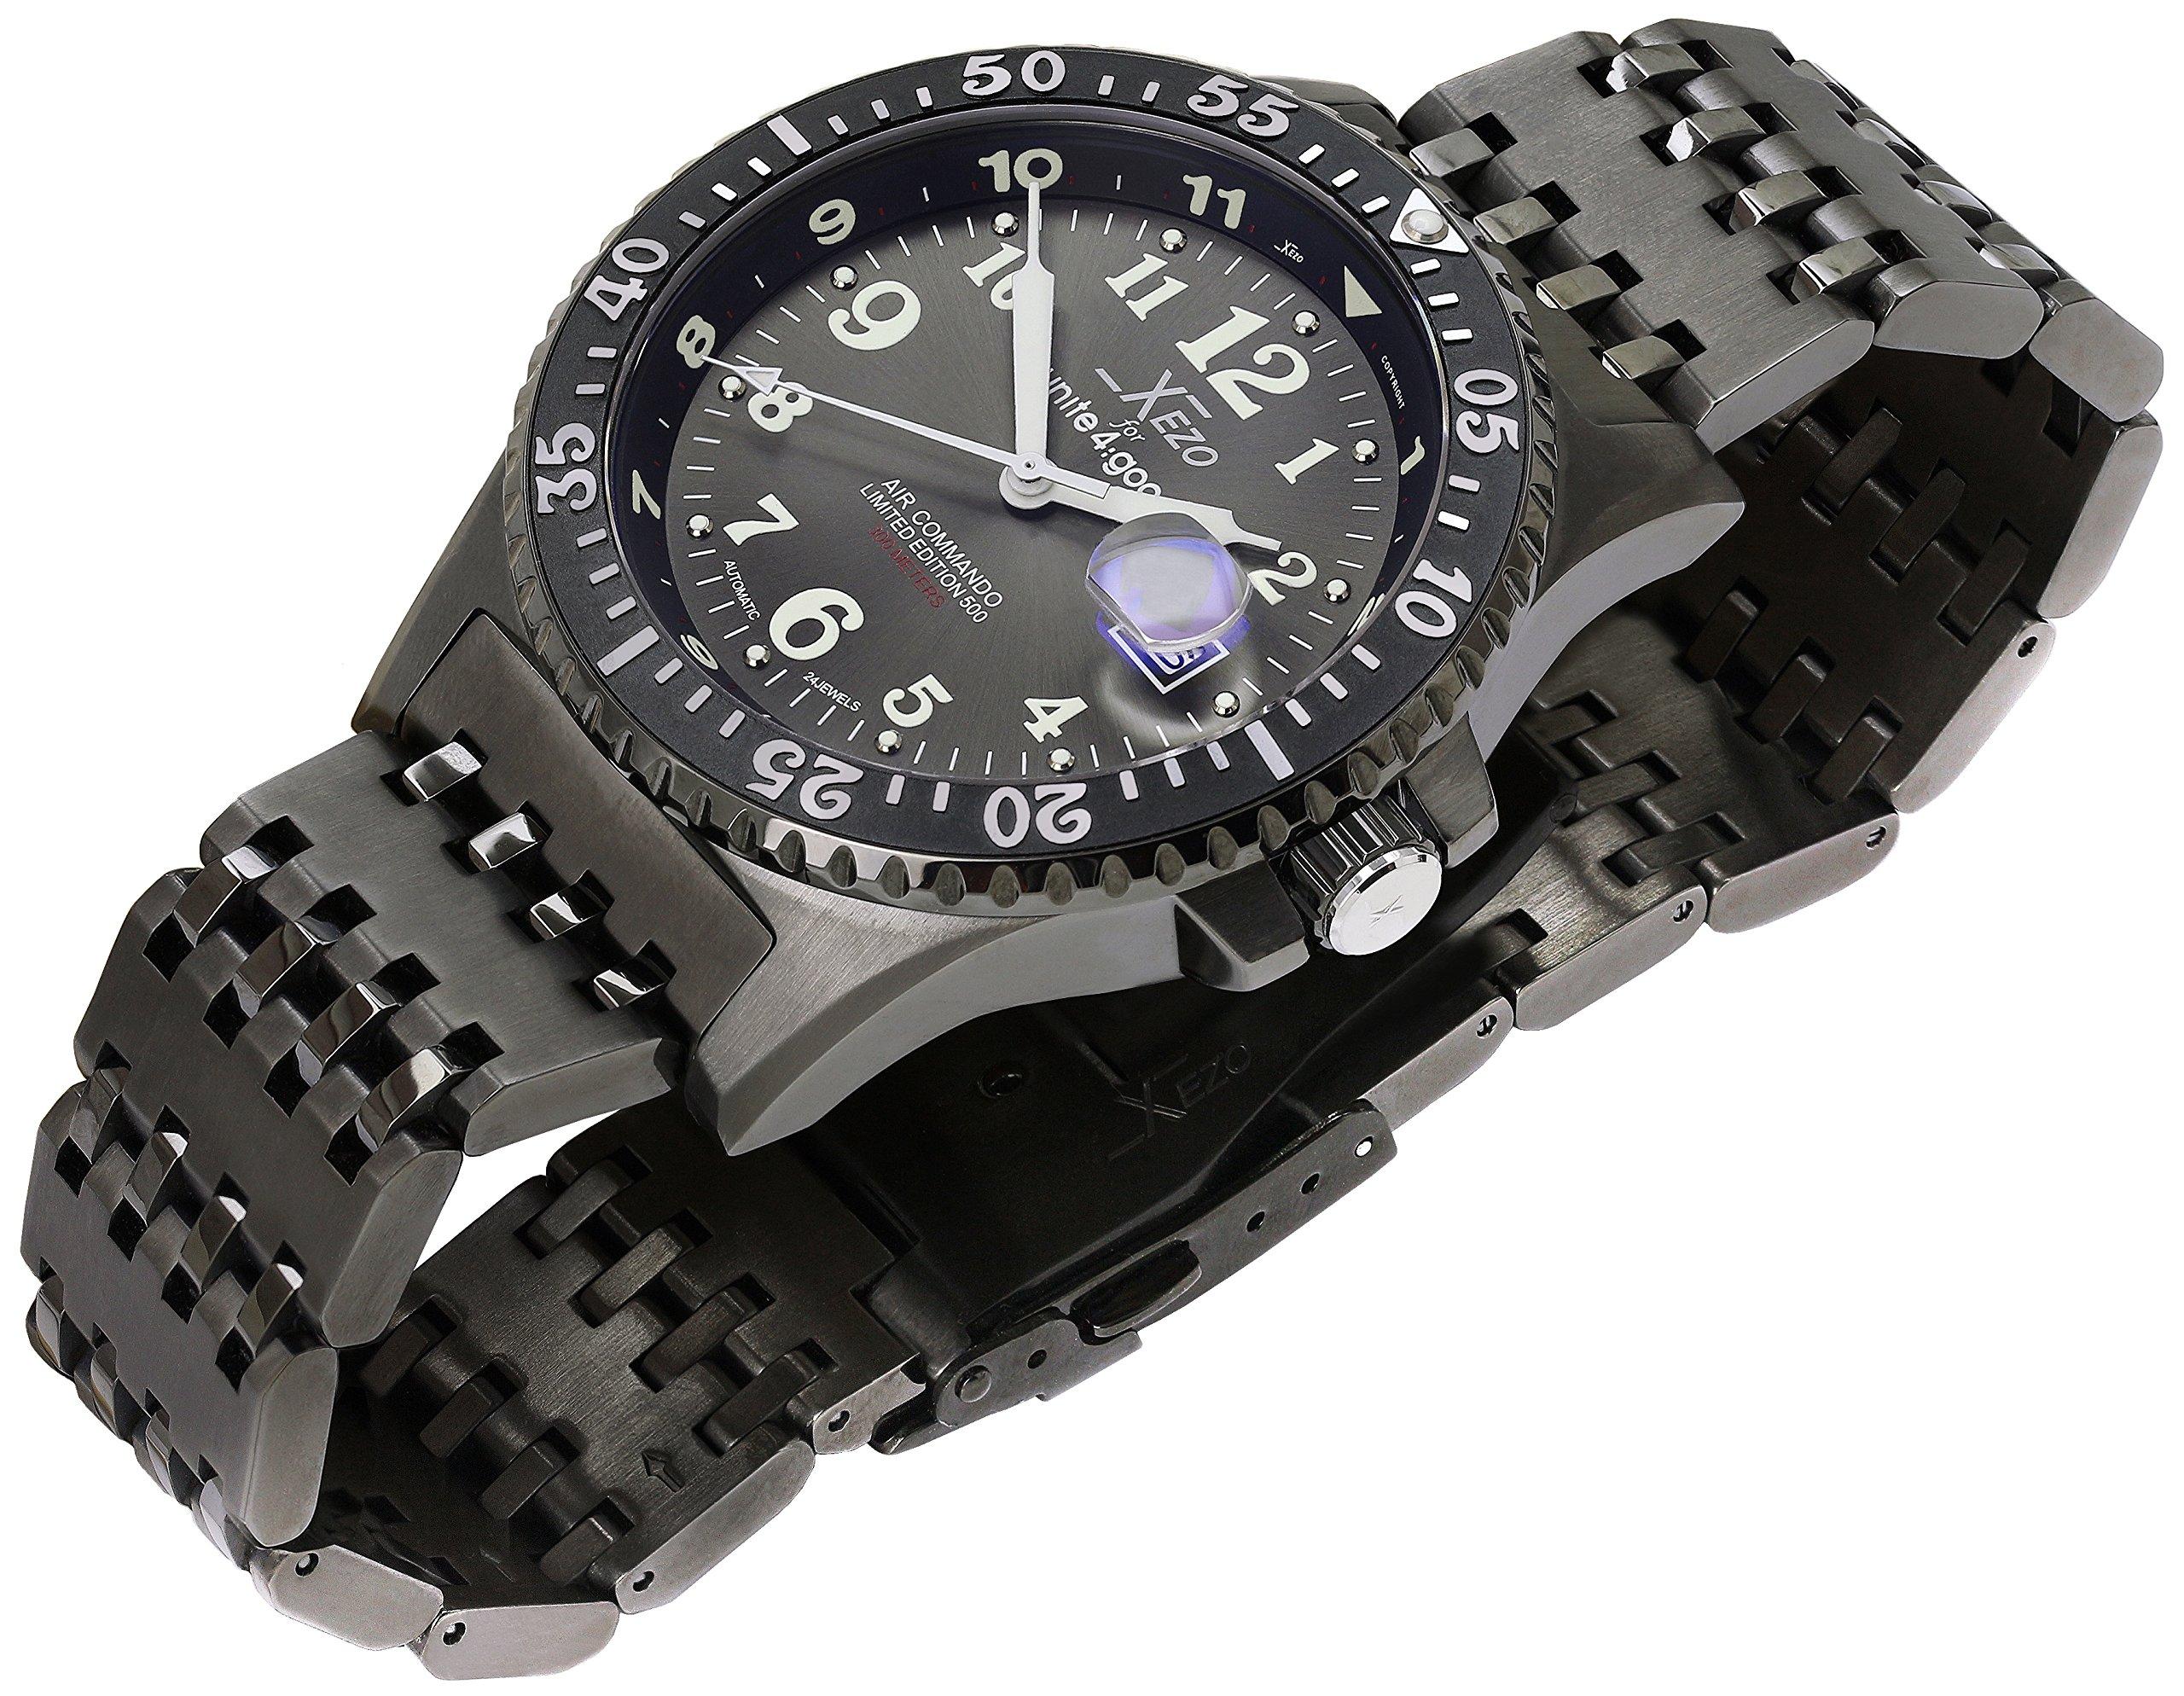 Xezo Air Commando Japanese-Automatic Diver's Pilots Gun-Metal Watch. Ruthenium Dial. 2nd Time Zone. 300 M WR